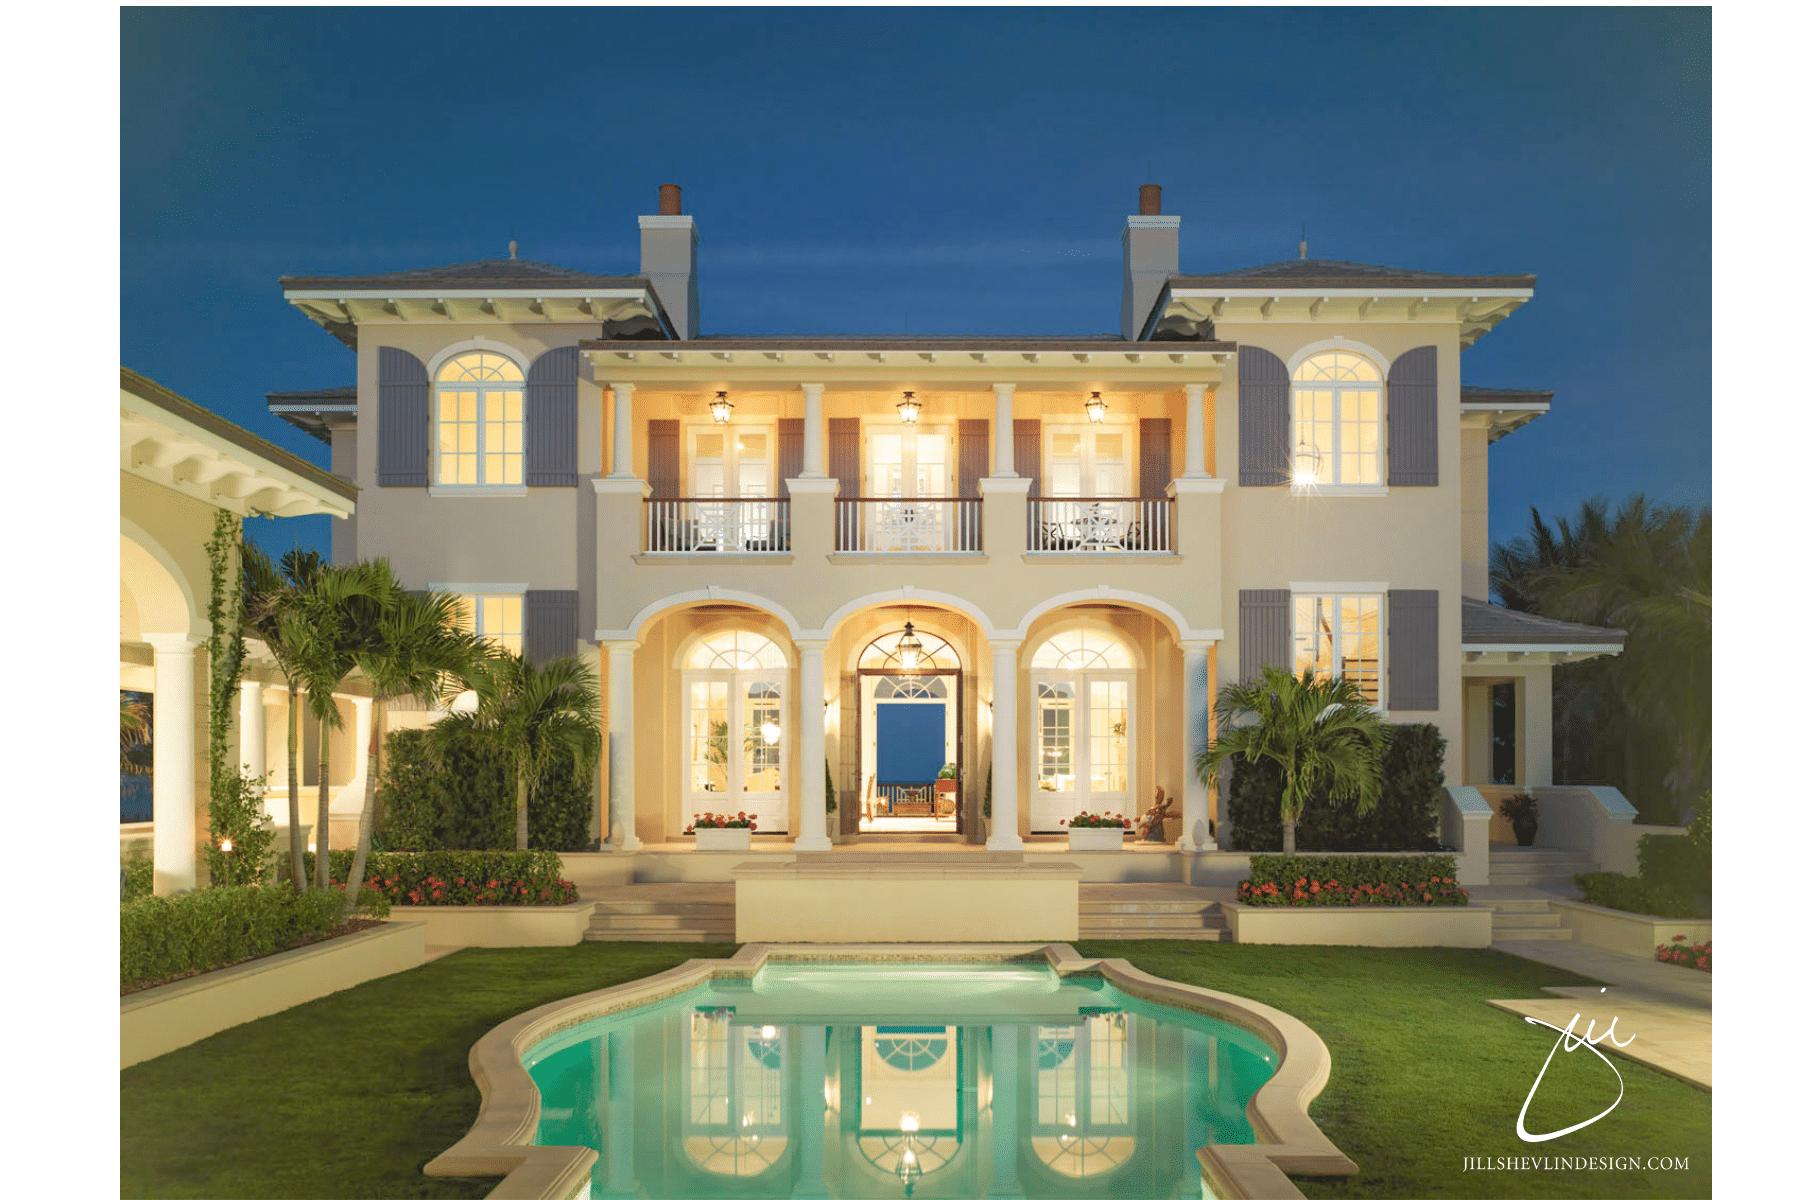 Jill shevlin Design Vero Beach Interior Designer Courtyard view of Ocean front home with grass